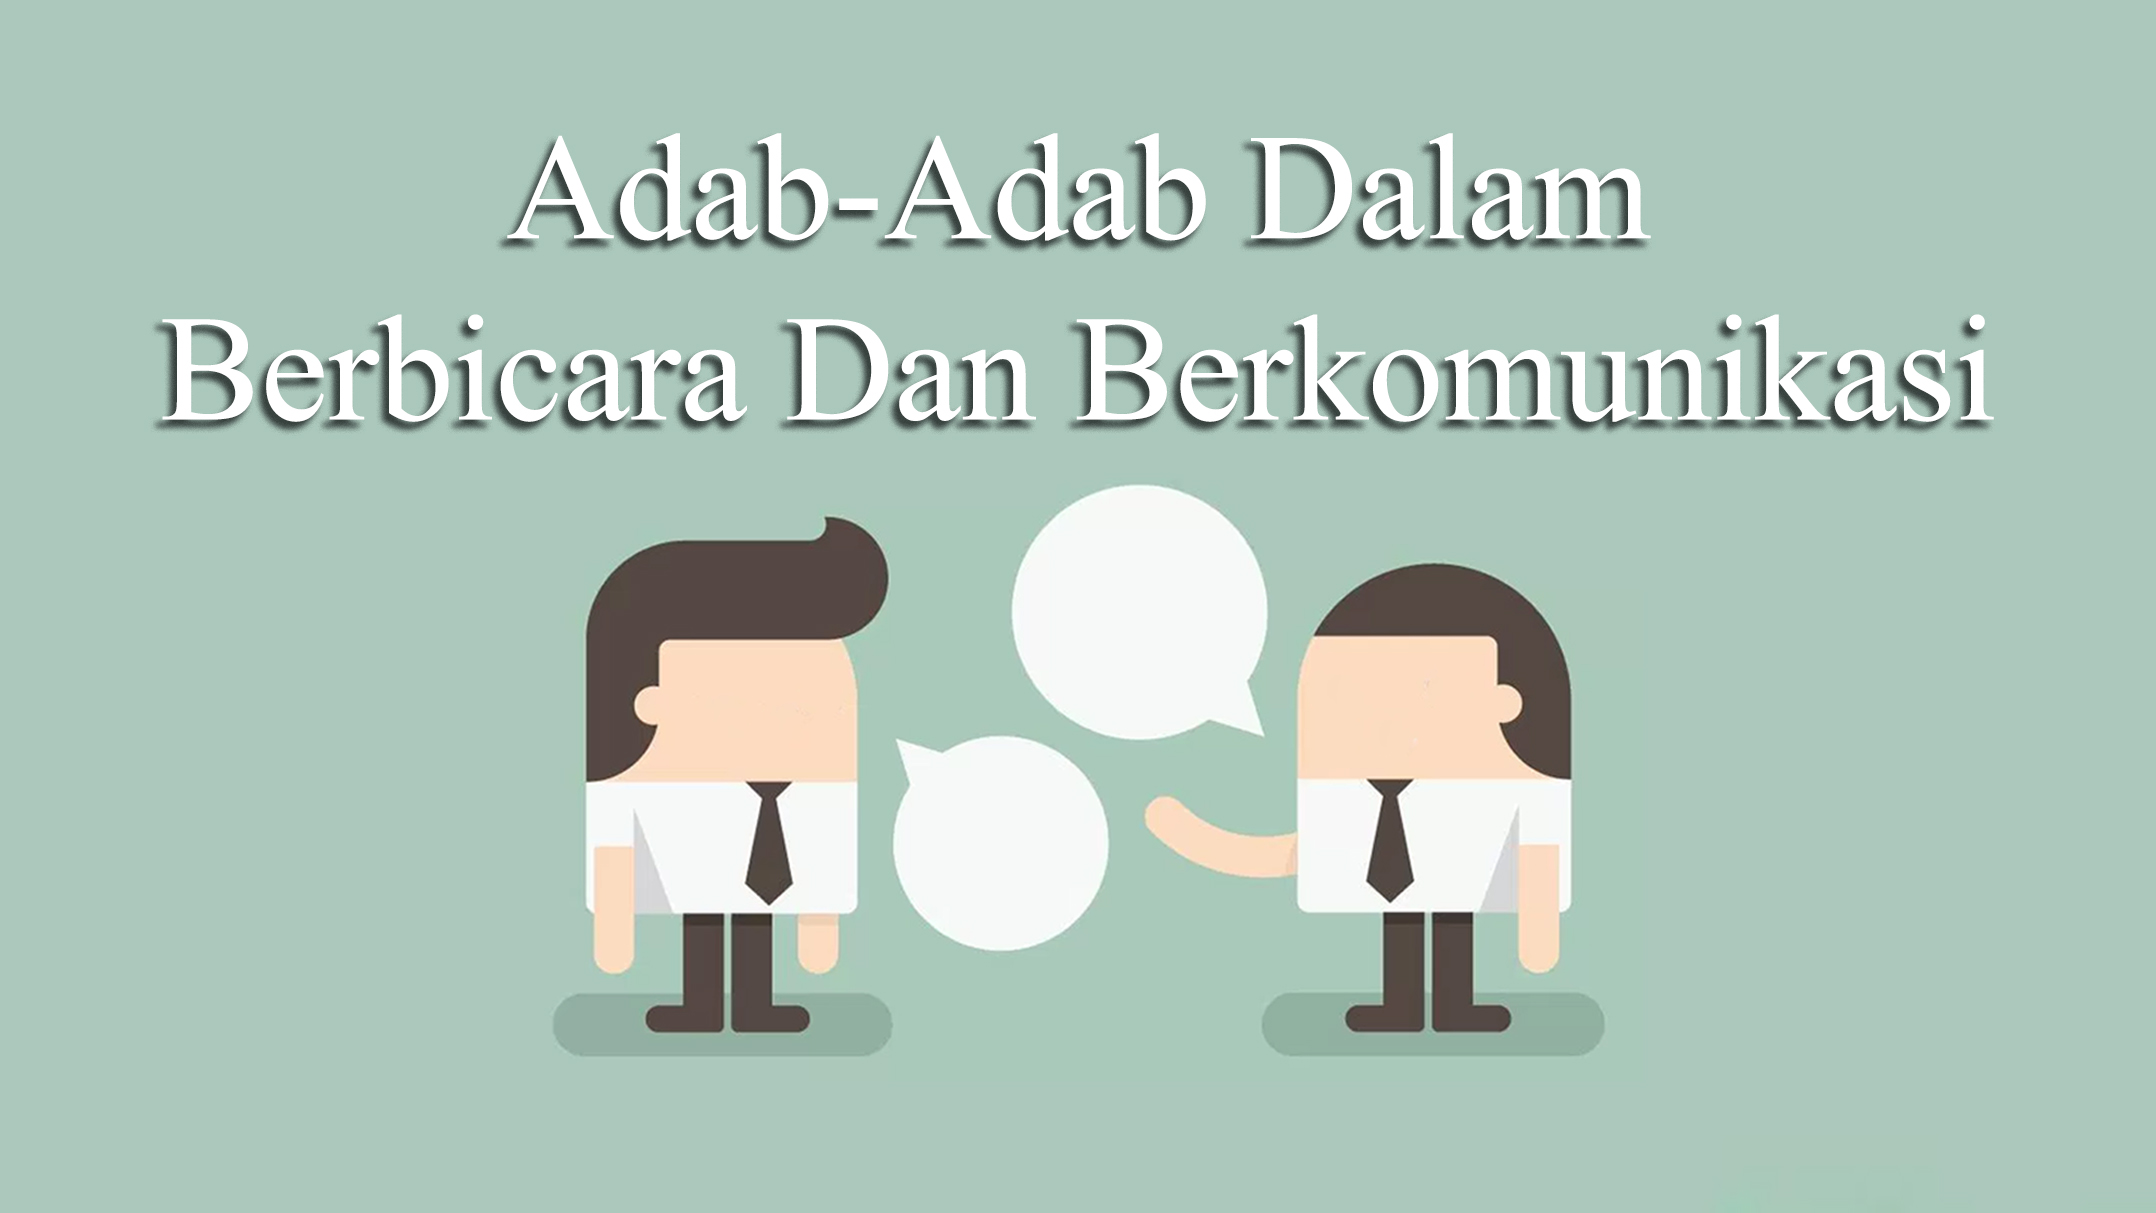 Adab-Adab Dalam Berbicara Dan Berkomunikasi